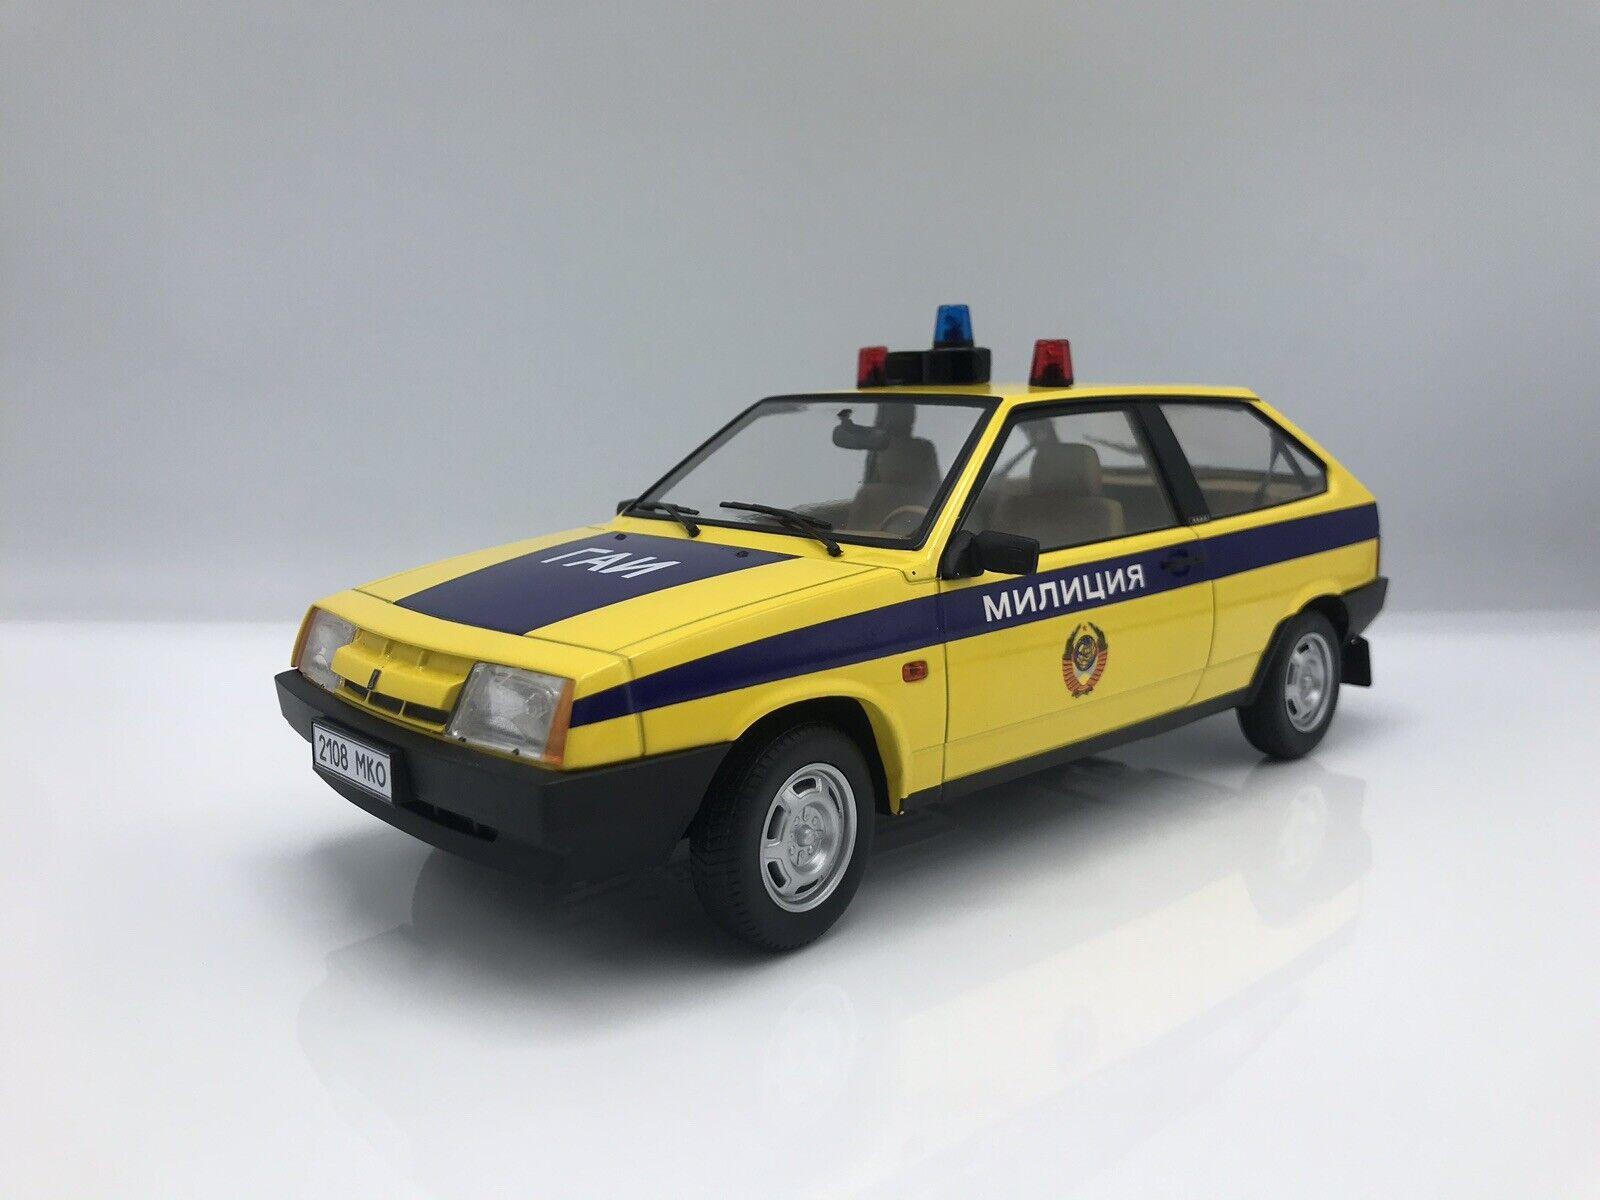 Lada Samara, giallo blu, policía su, milizija, 1984 - 1 18 KK-scale new